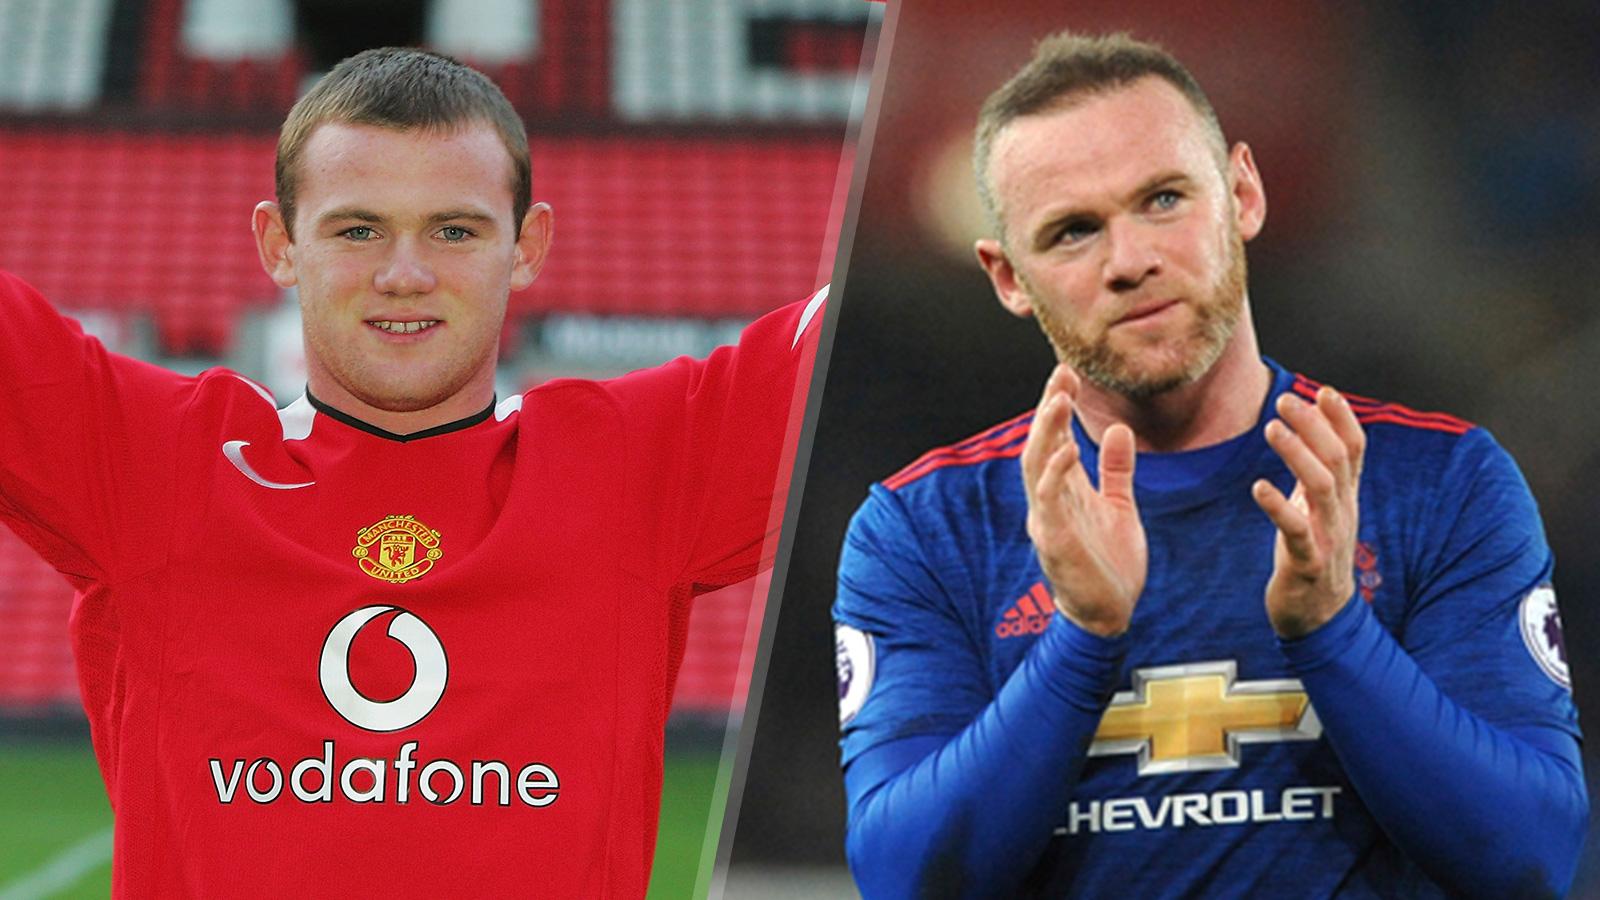 012117-Wayne-Rooney-split